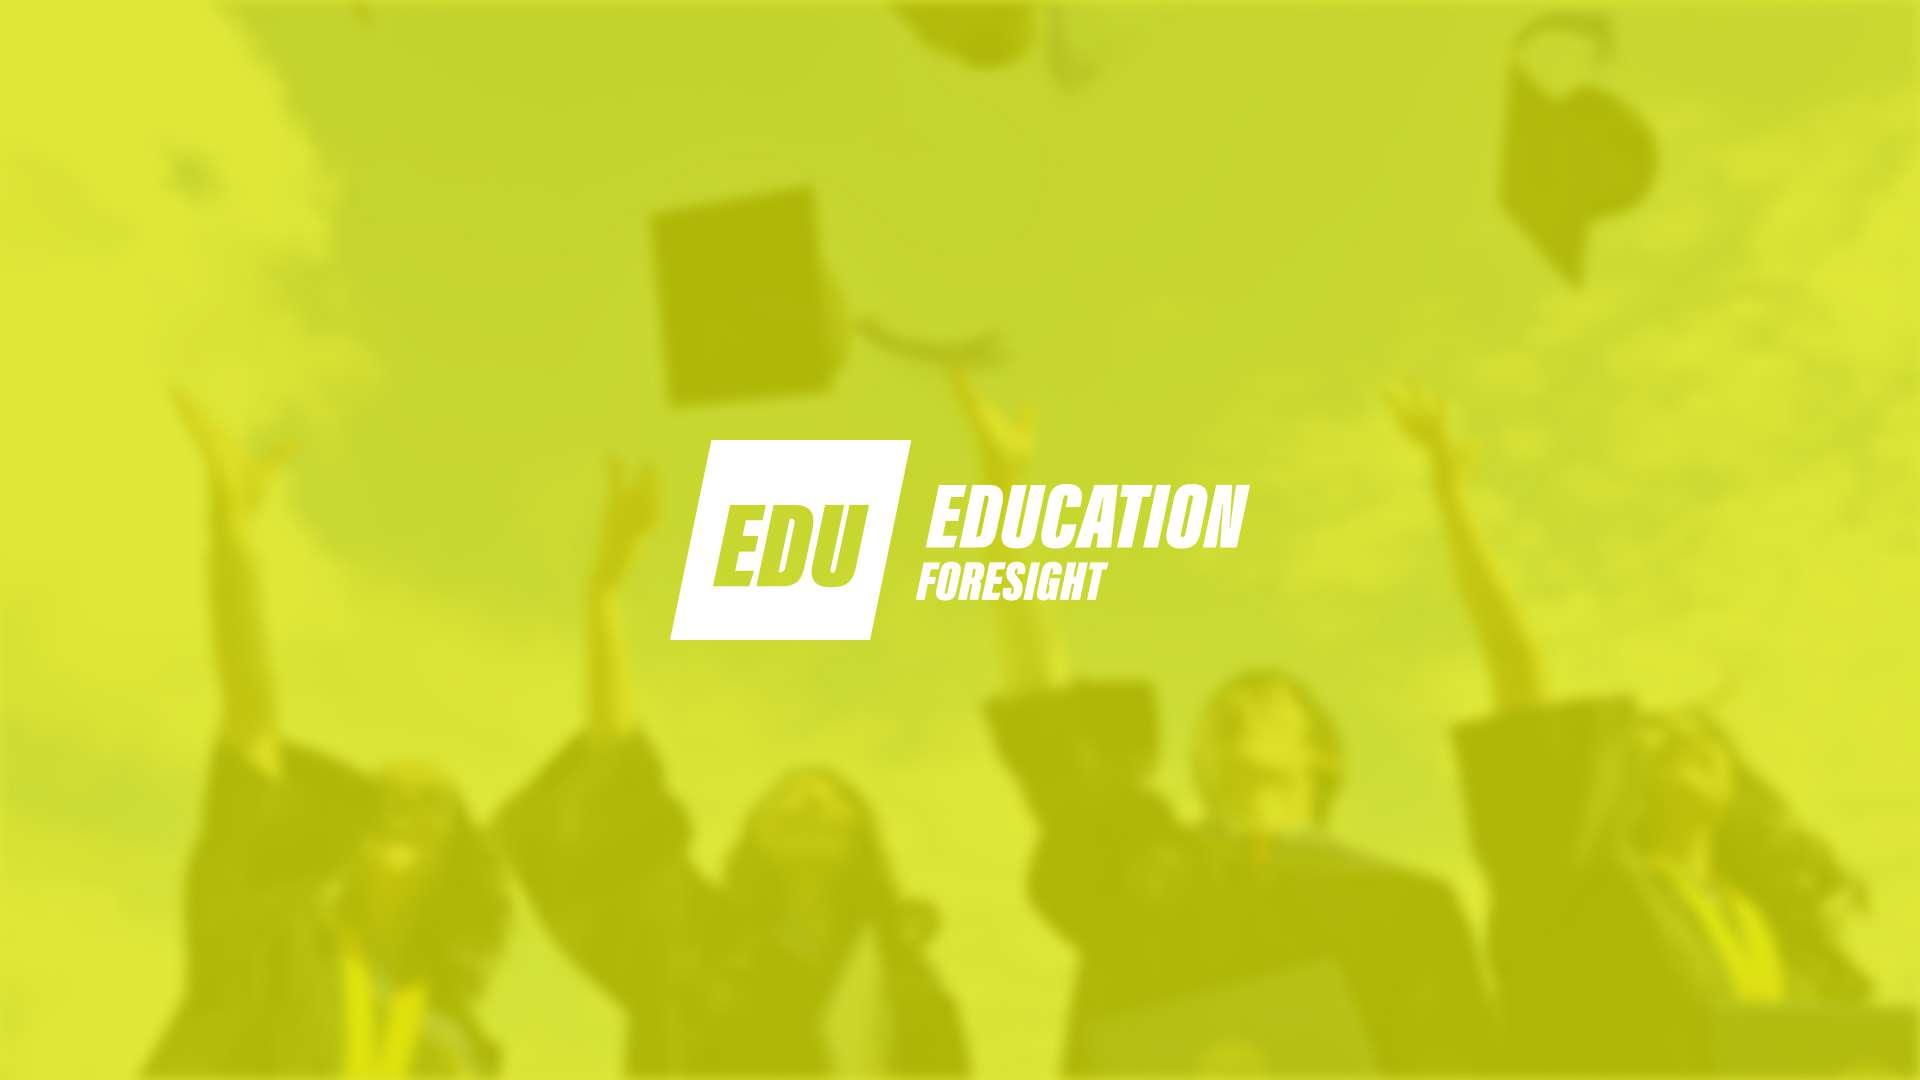 Education Foresight